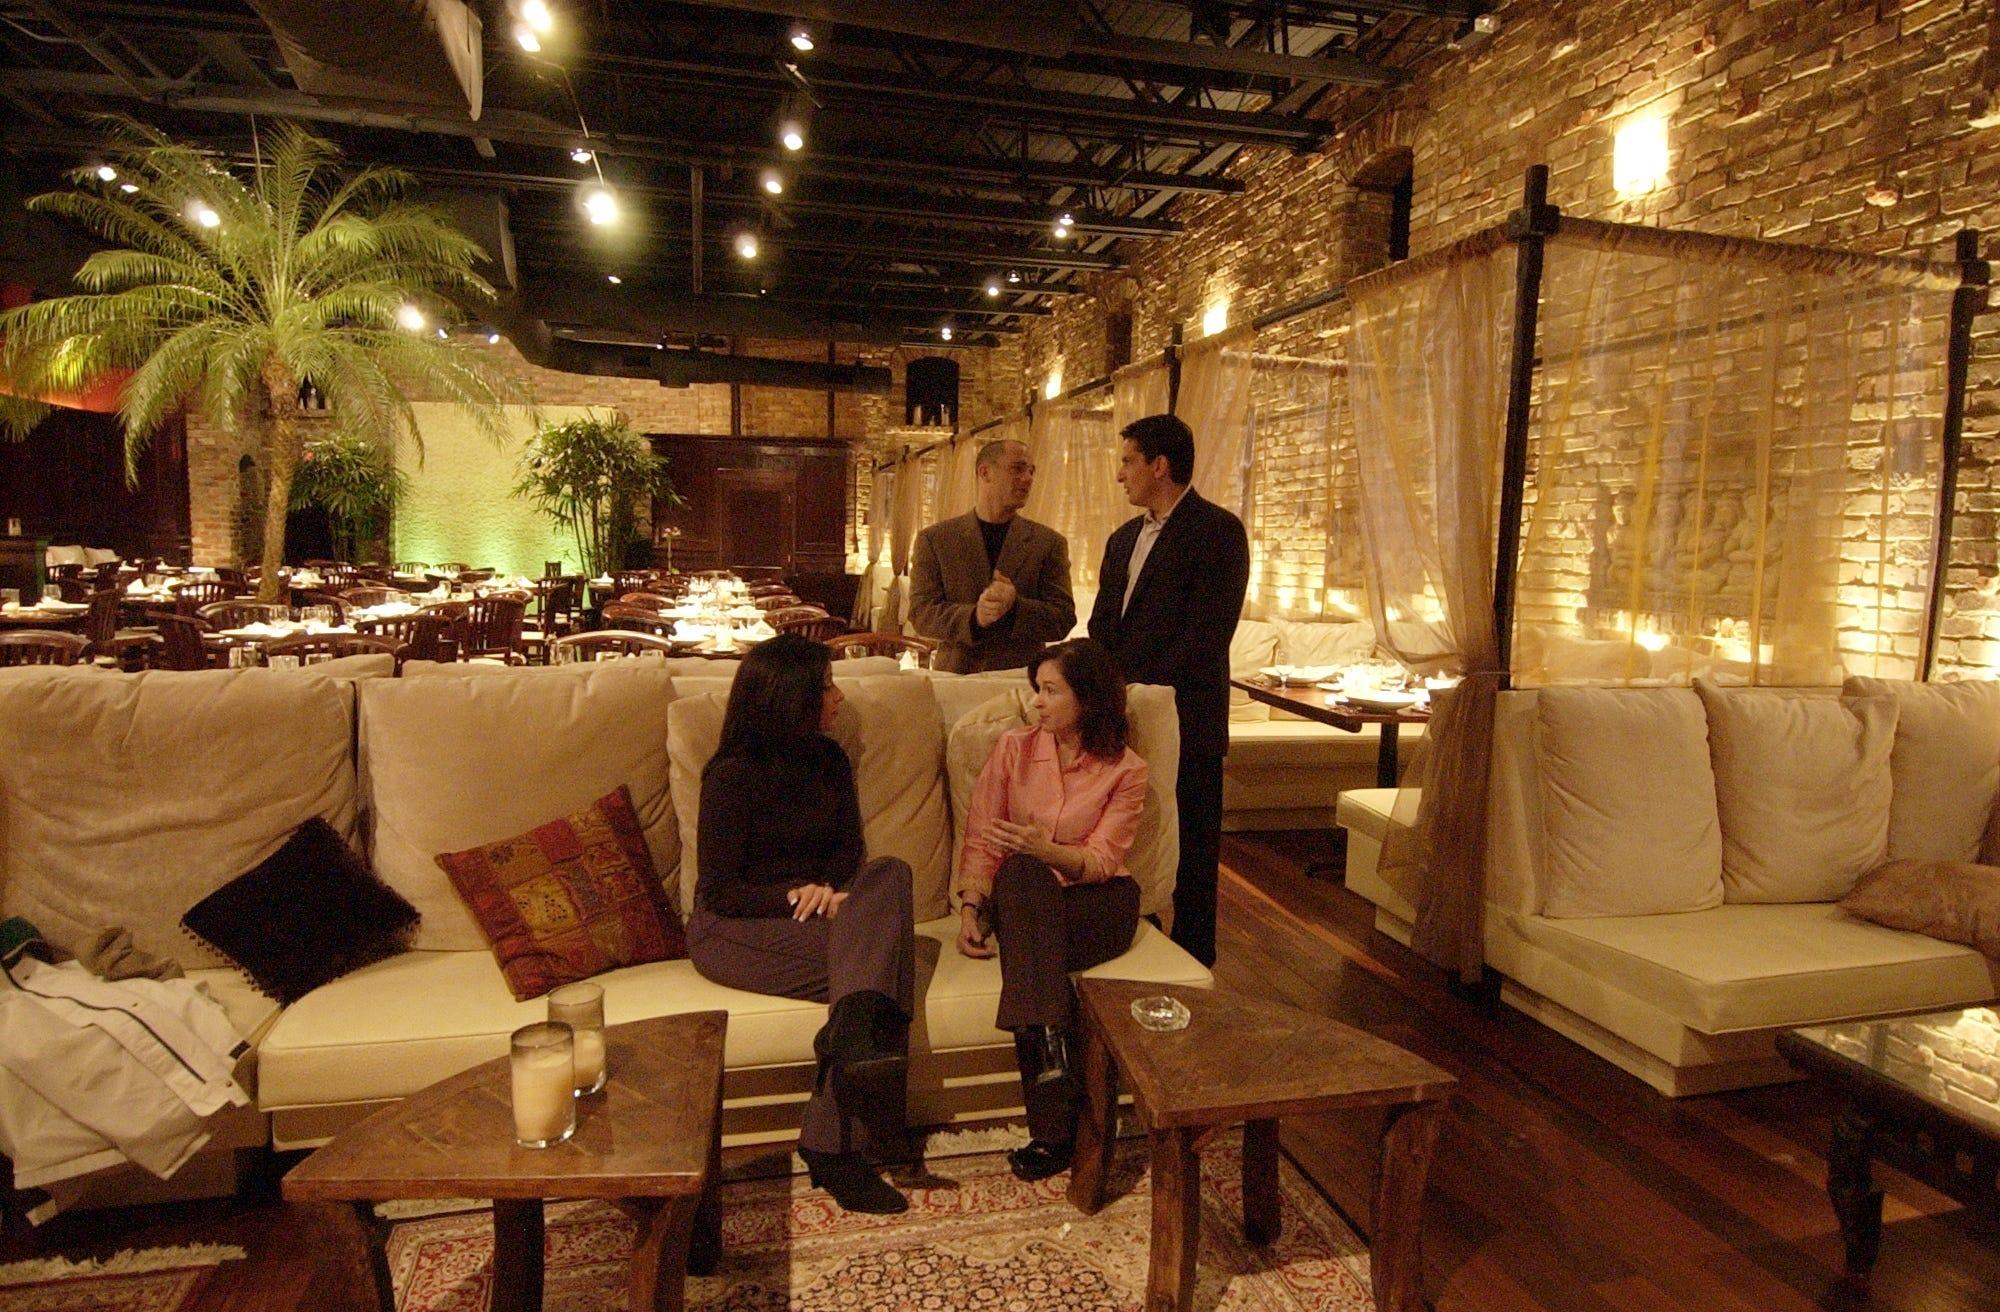 Chakra restaurant in Paramus NJ to close Saturday